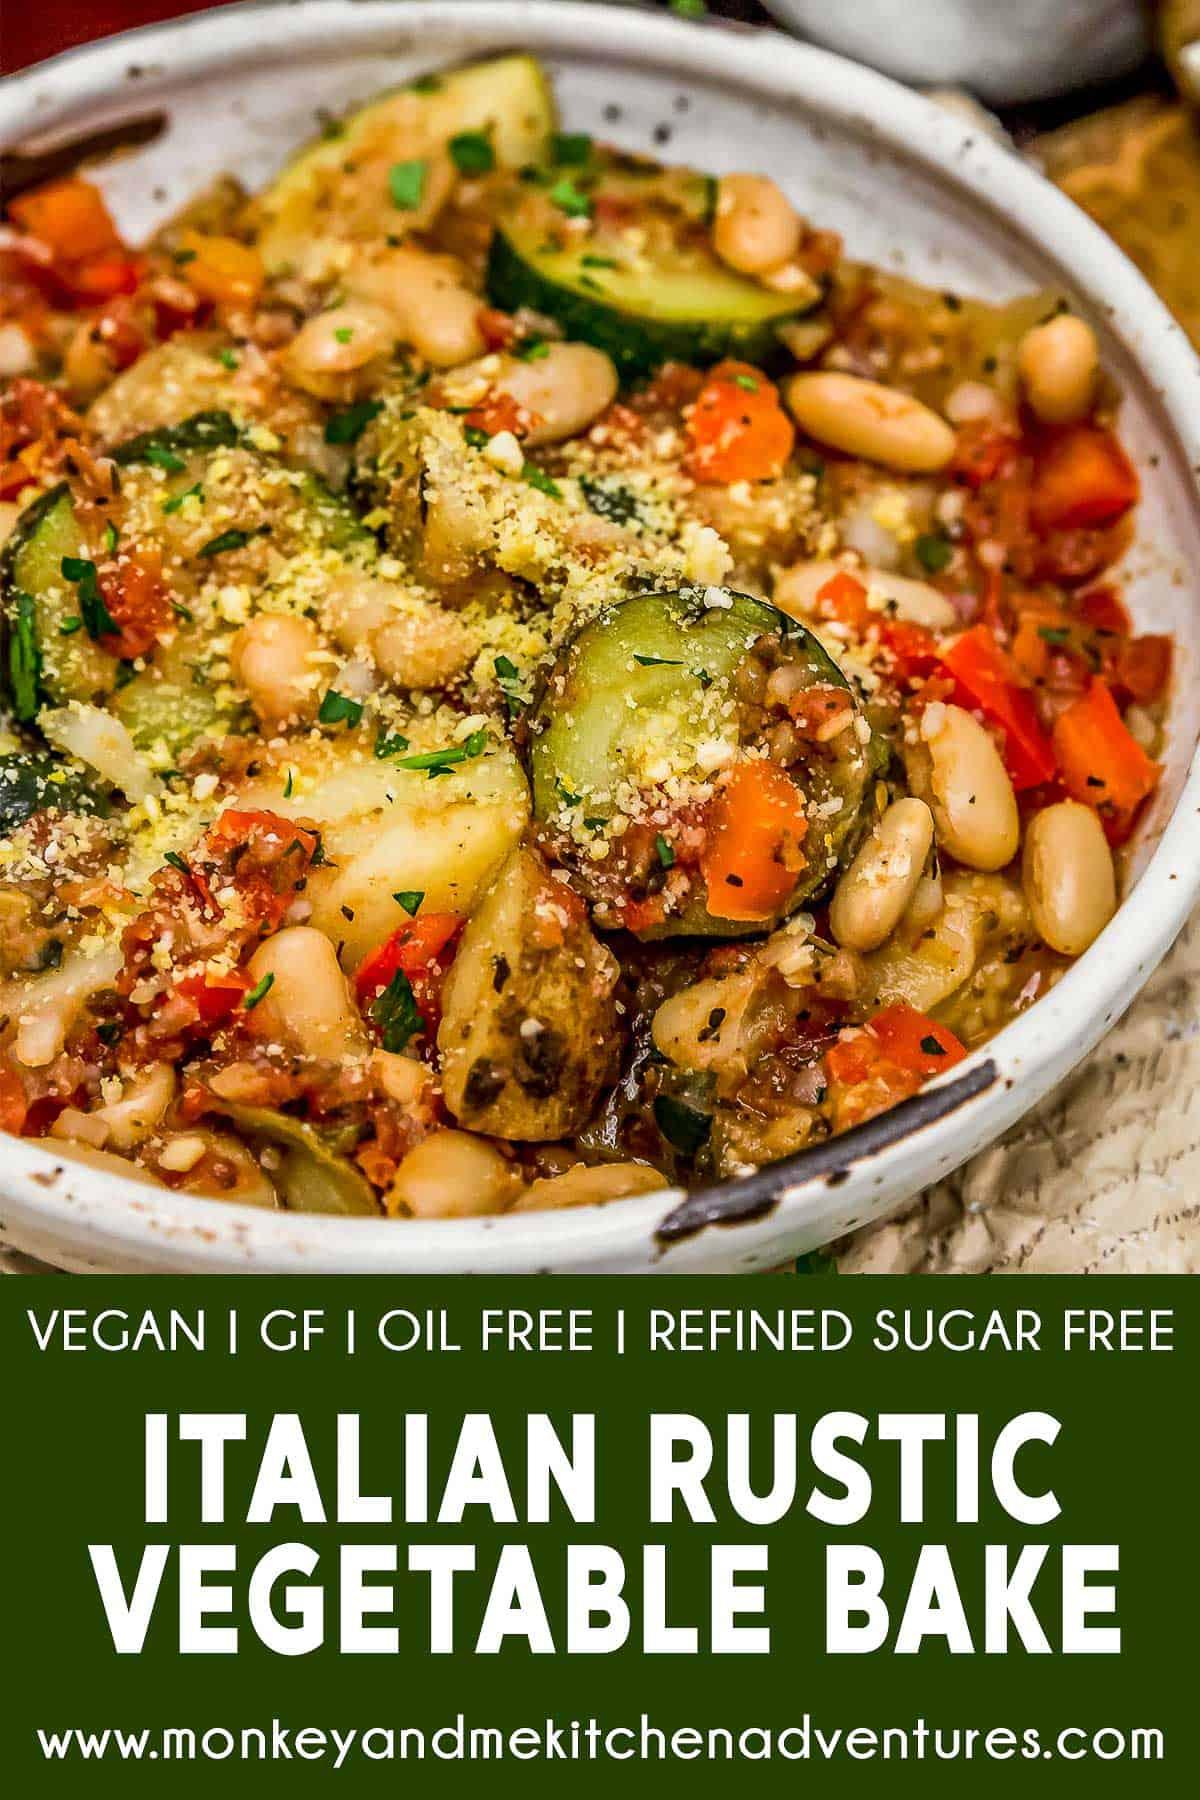 Rustic Italian Vegetable Bake Monkey And Me Kitchen Adventures